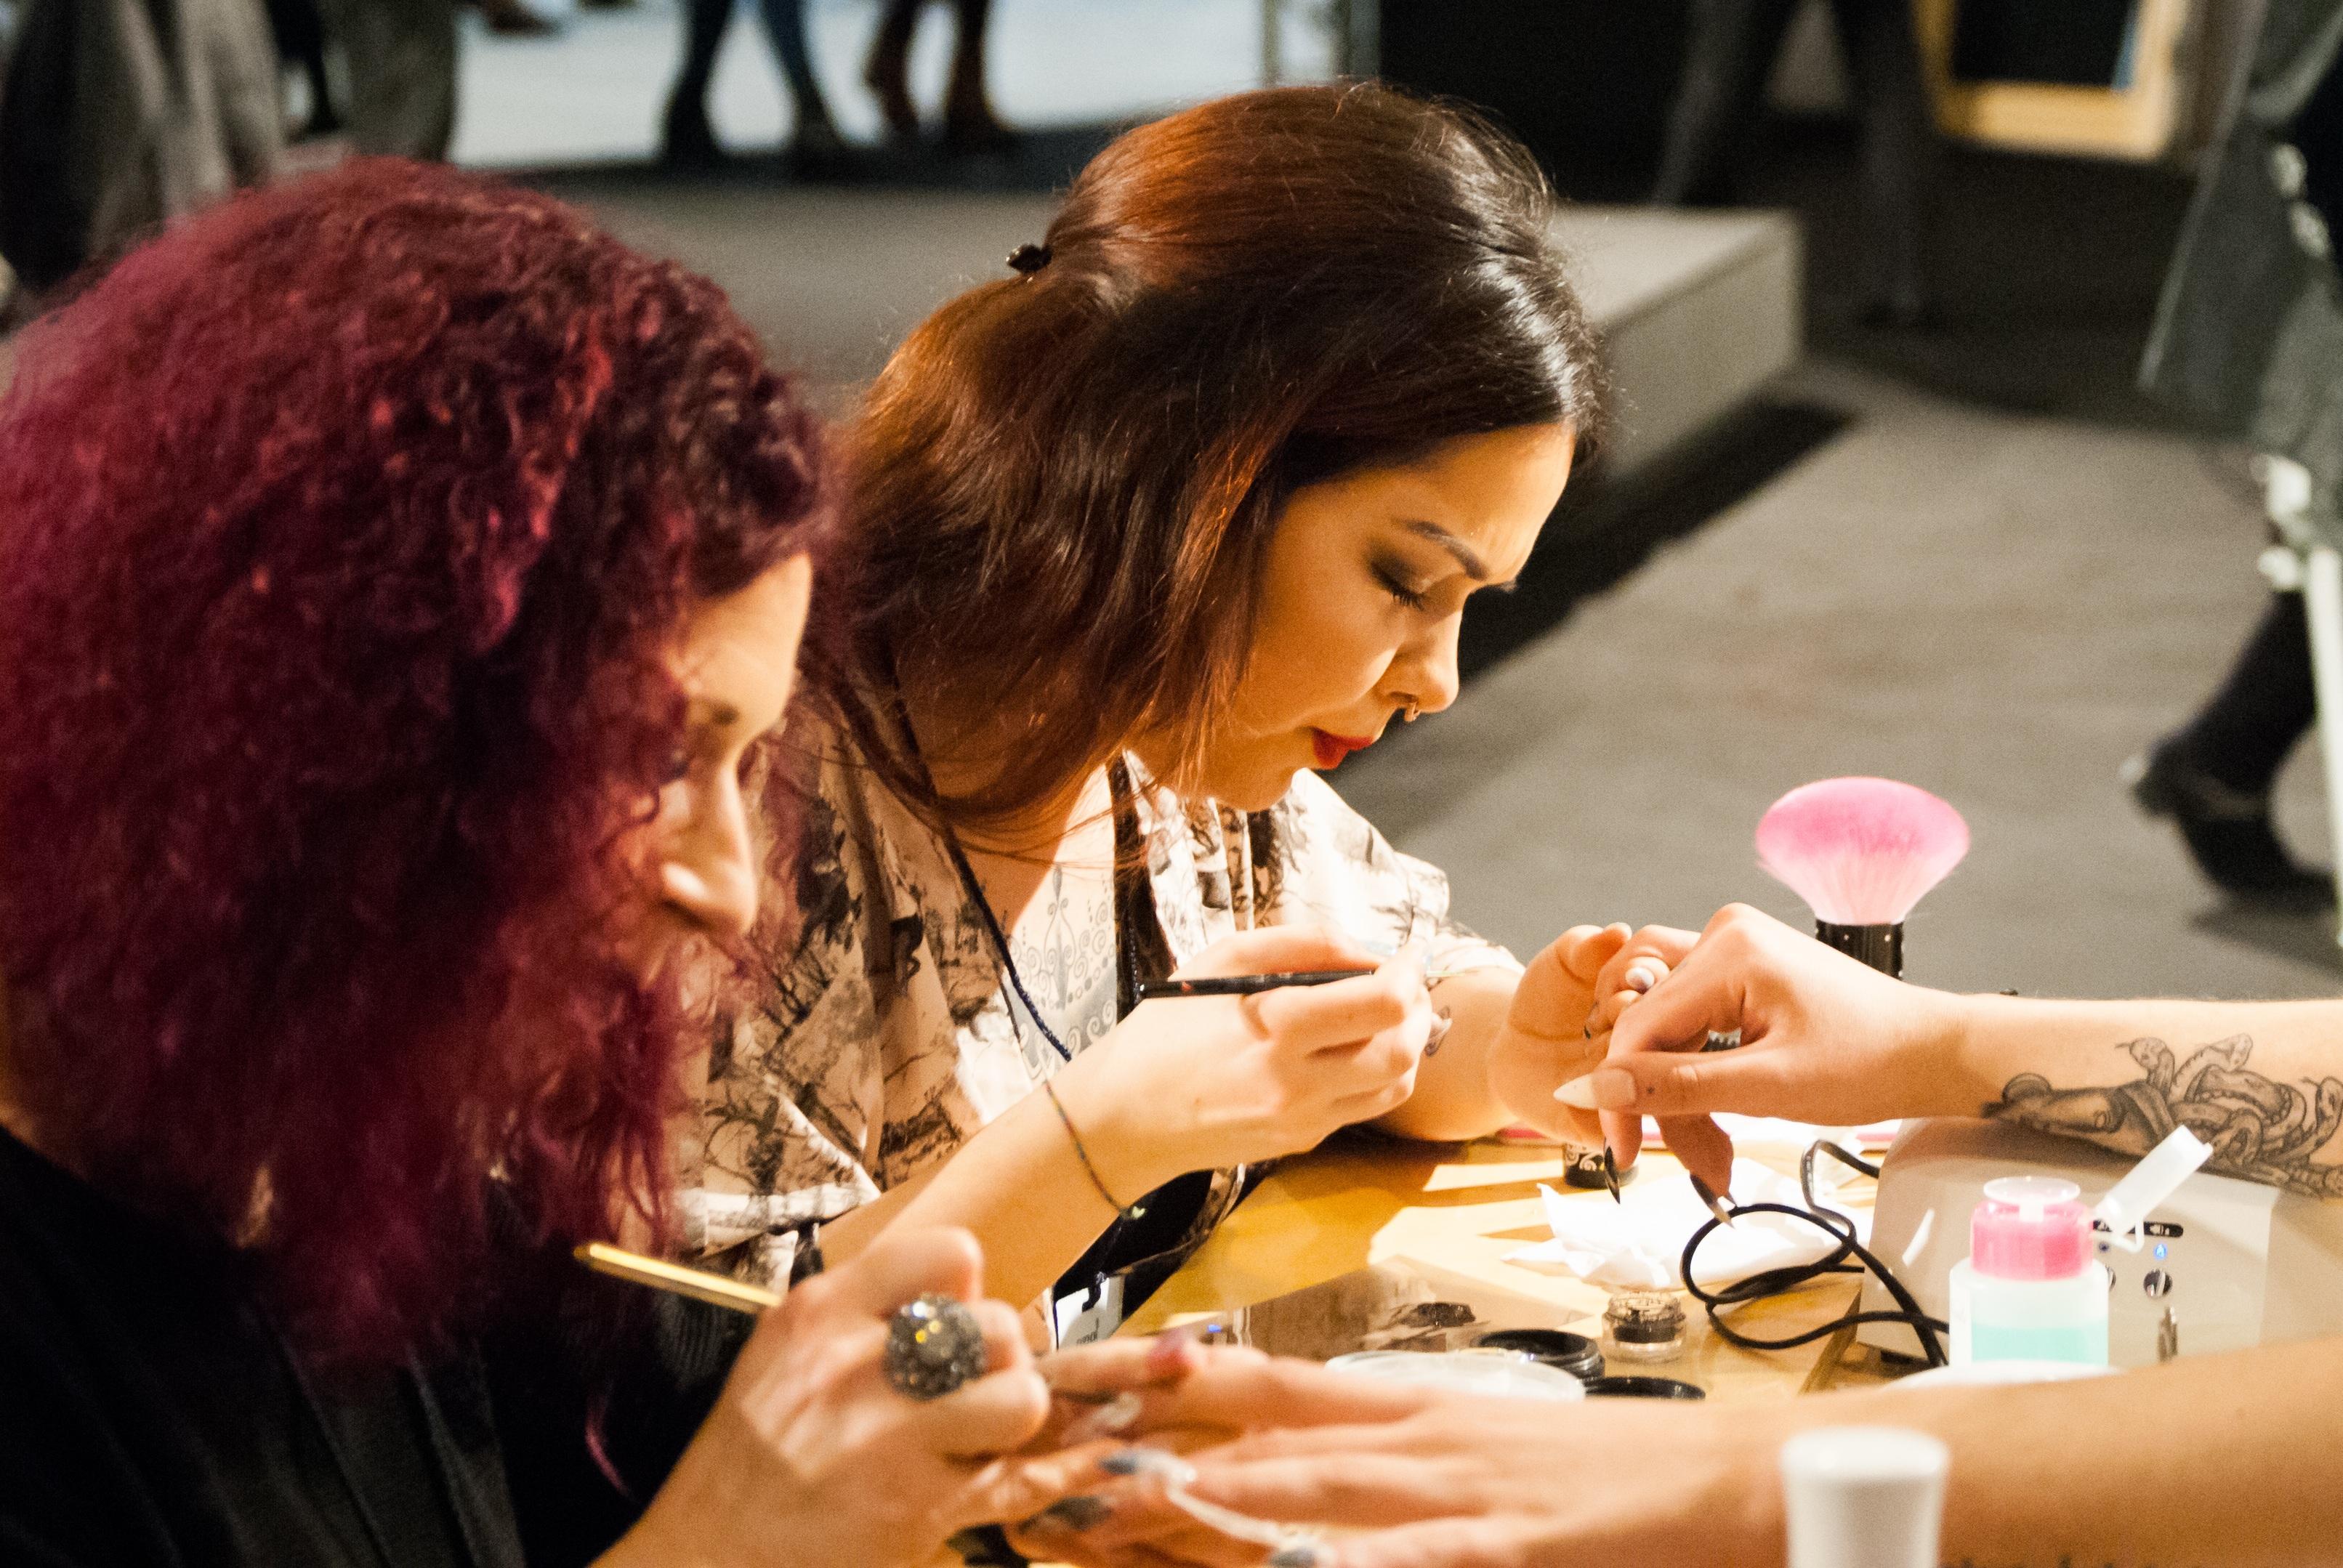 Fotos gratis : hombre, niña, modelo, manicura, mujer, arte de uñas ...